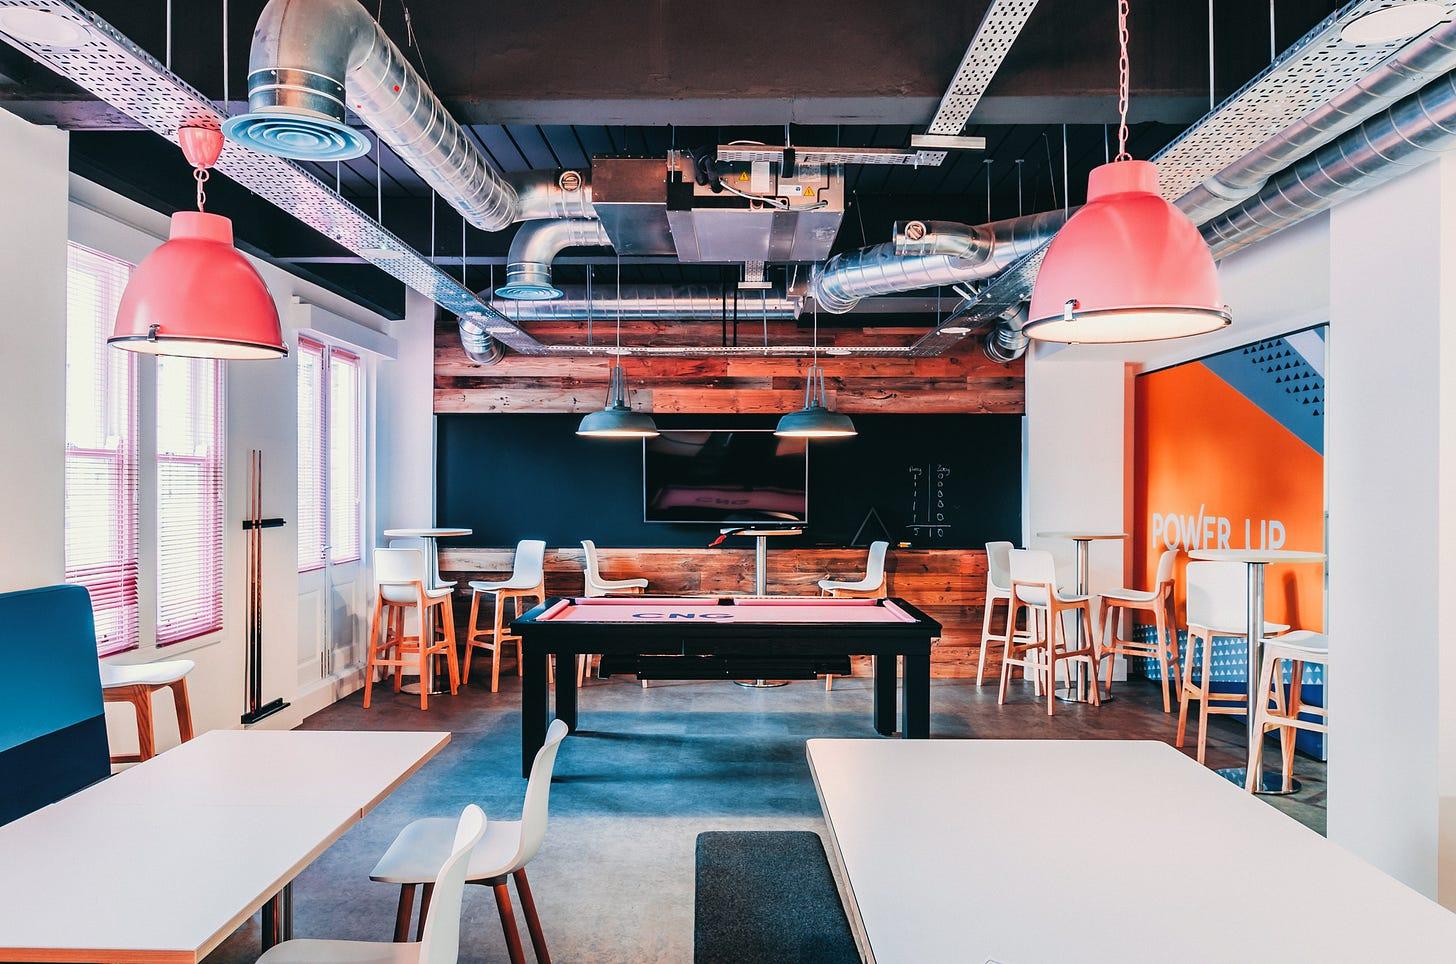 Commercial Breakout Room (credit: ACI UK)